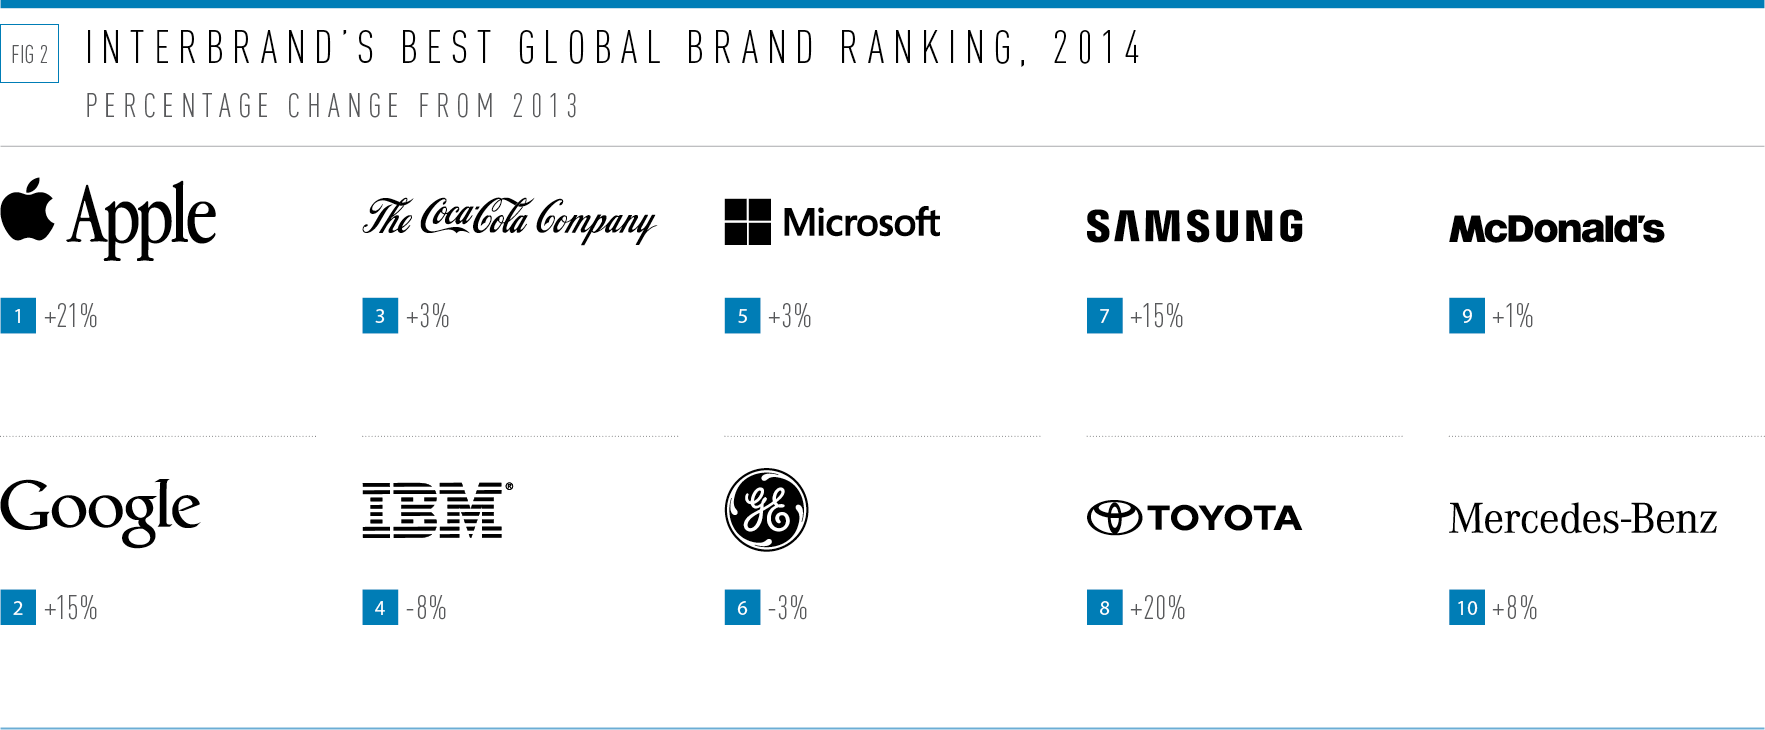 Interbrand's best global brand ranking 2014